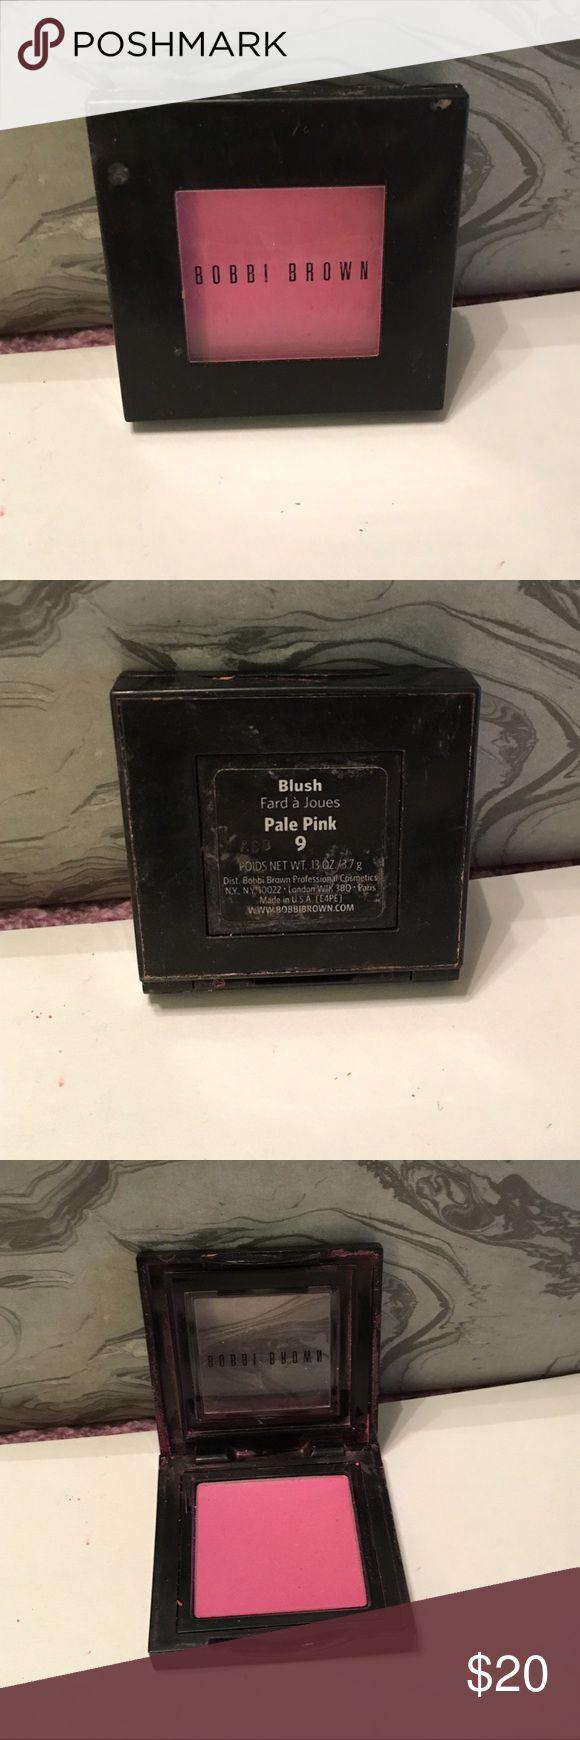 "Bobbi Brown ""Pale Pink"" Blush - used once Bobbi Brown ""Pale Pink"" Blush - used once • beautiful saturated color • cleaned and ready to ship • Bobbi Brown Makeup Blush"